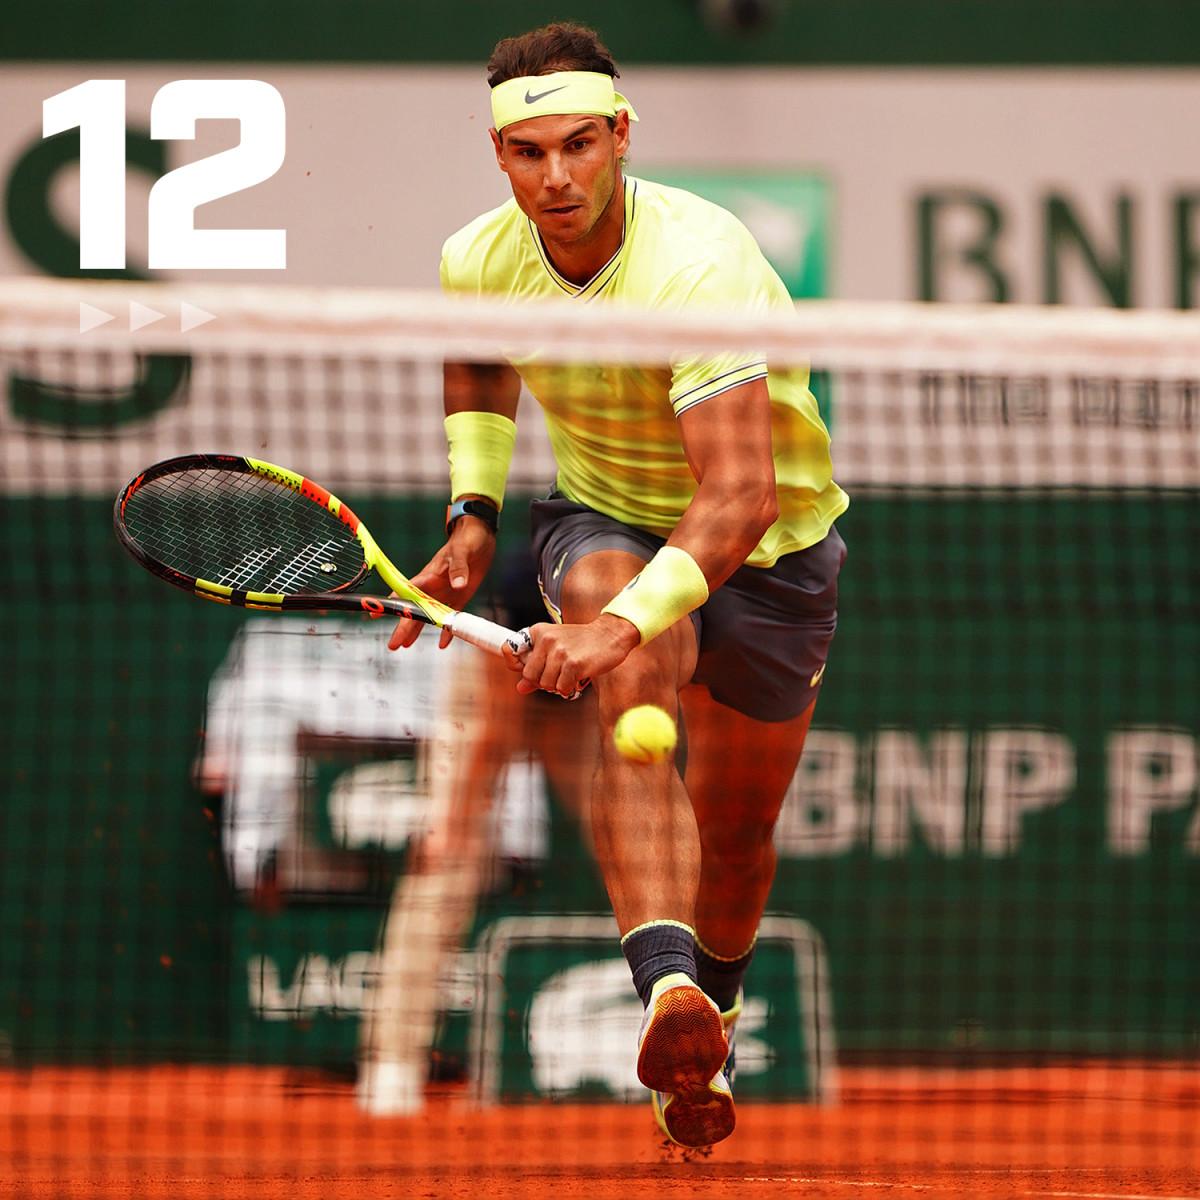 Rafael_Nadal_02_GRAPHIC_M12